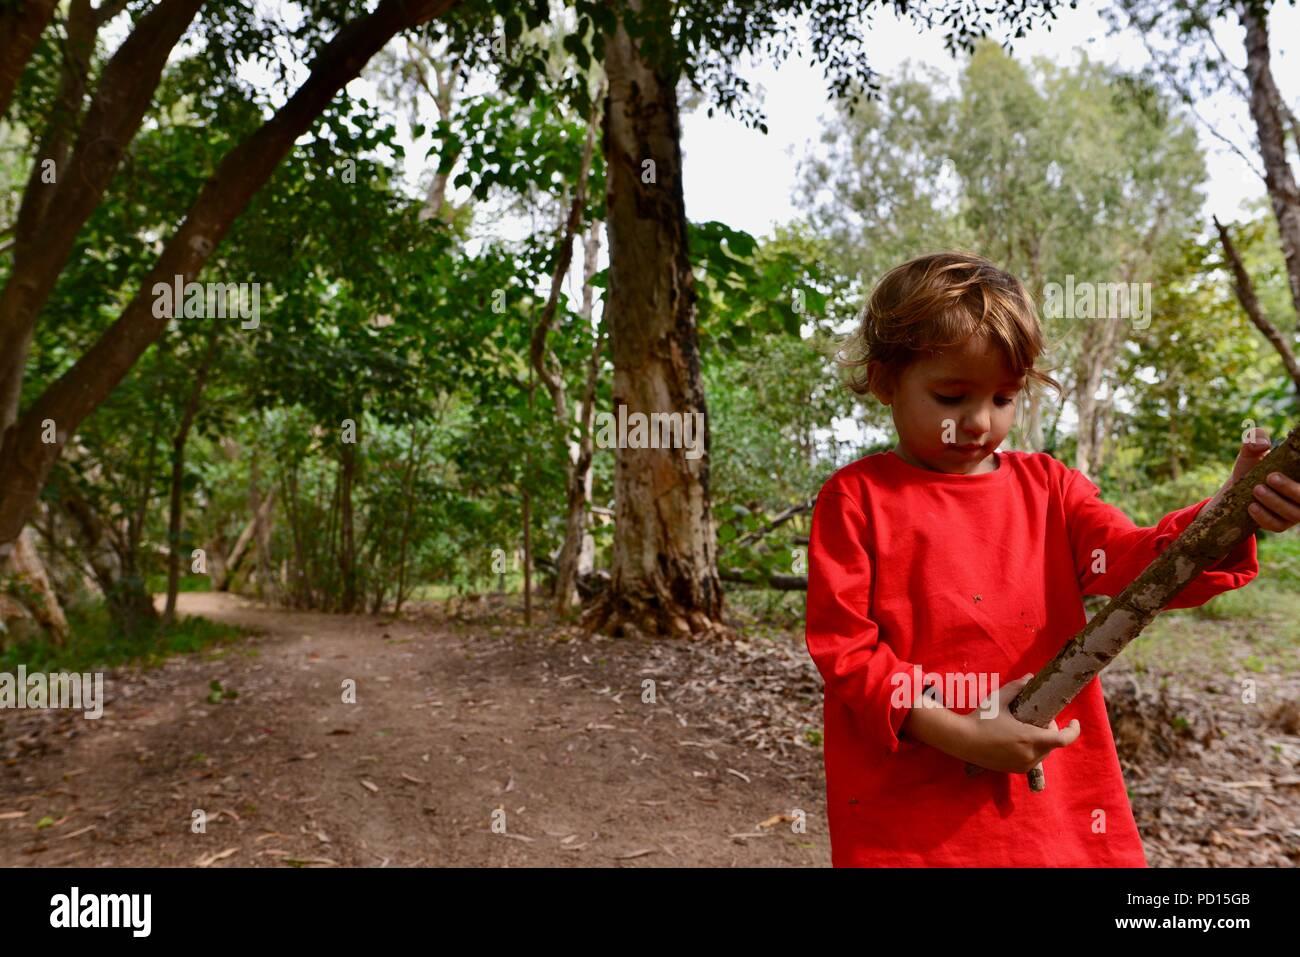 Niño mira un palo que acaba de recoger, Booroona sendero en el Ross River, Rasmussen QLD 4815, Australia Foto de stock